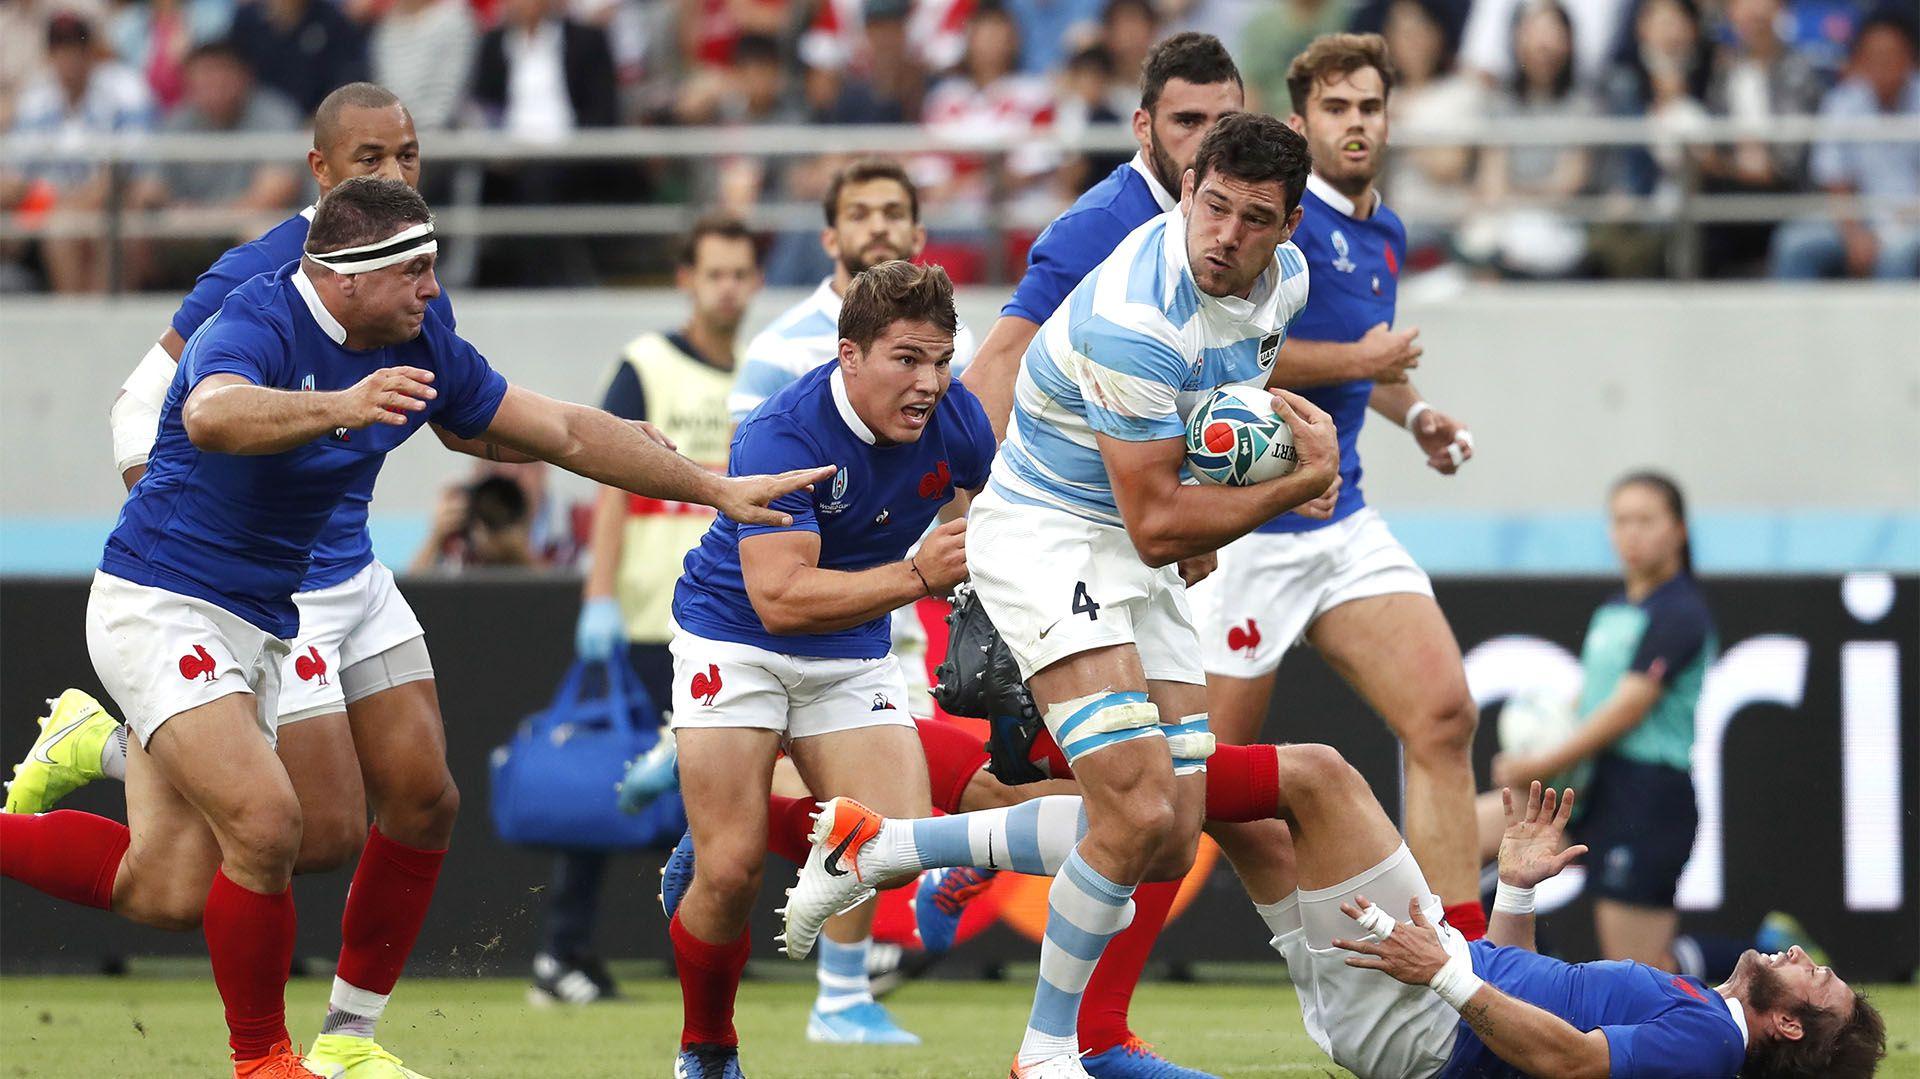 Argentina cayó por 23 a 21 ante Francia, en el marco de la primera fecha del Grupo C del Mundial de Rugby Japón 2019 (REUTERS/Matthew Childs)